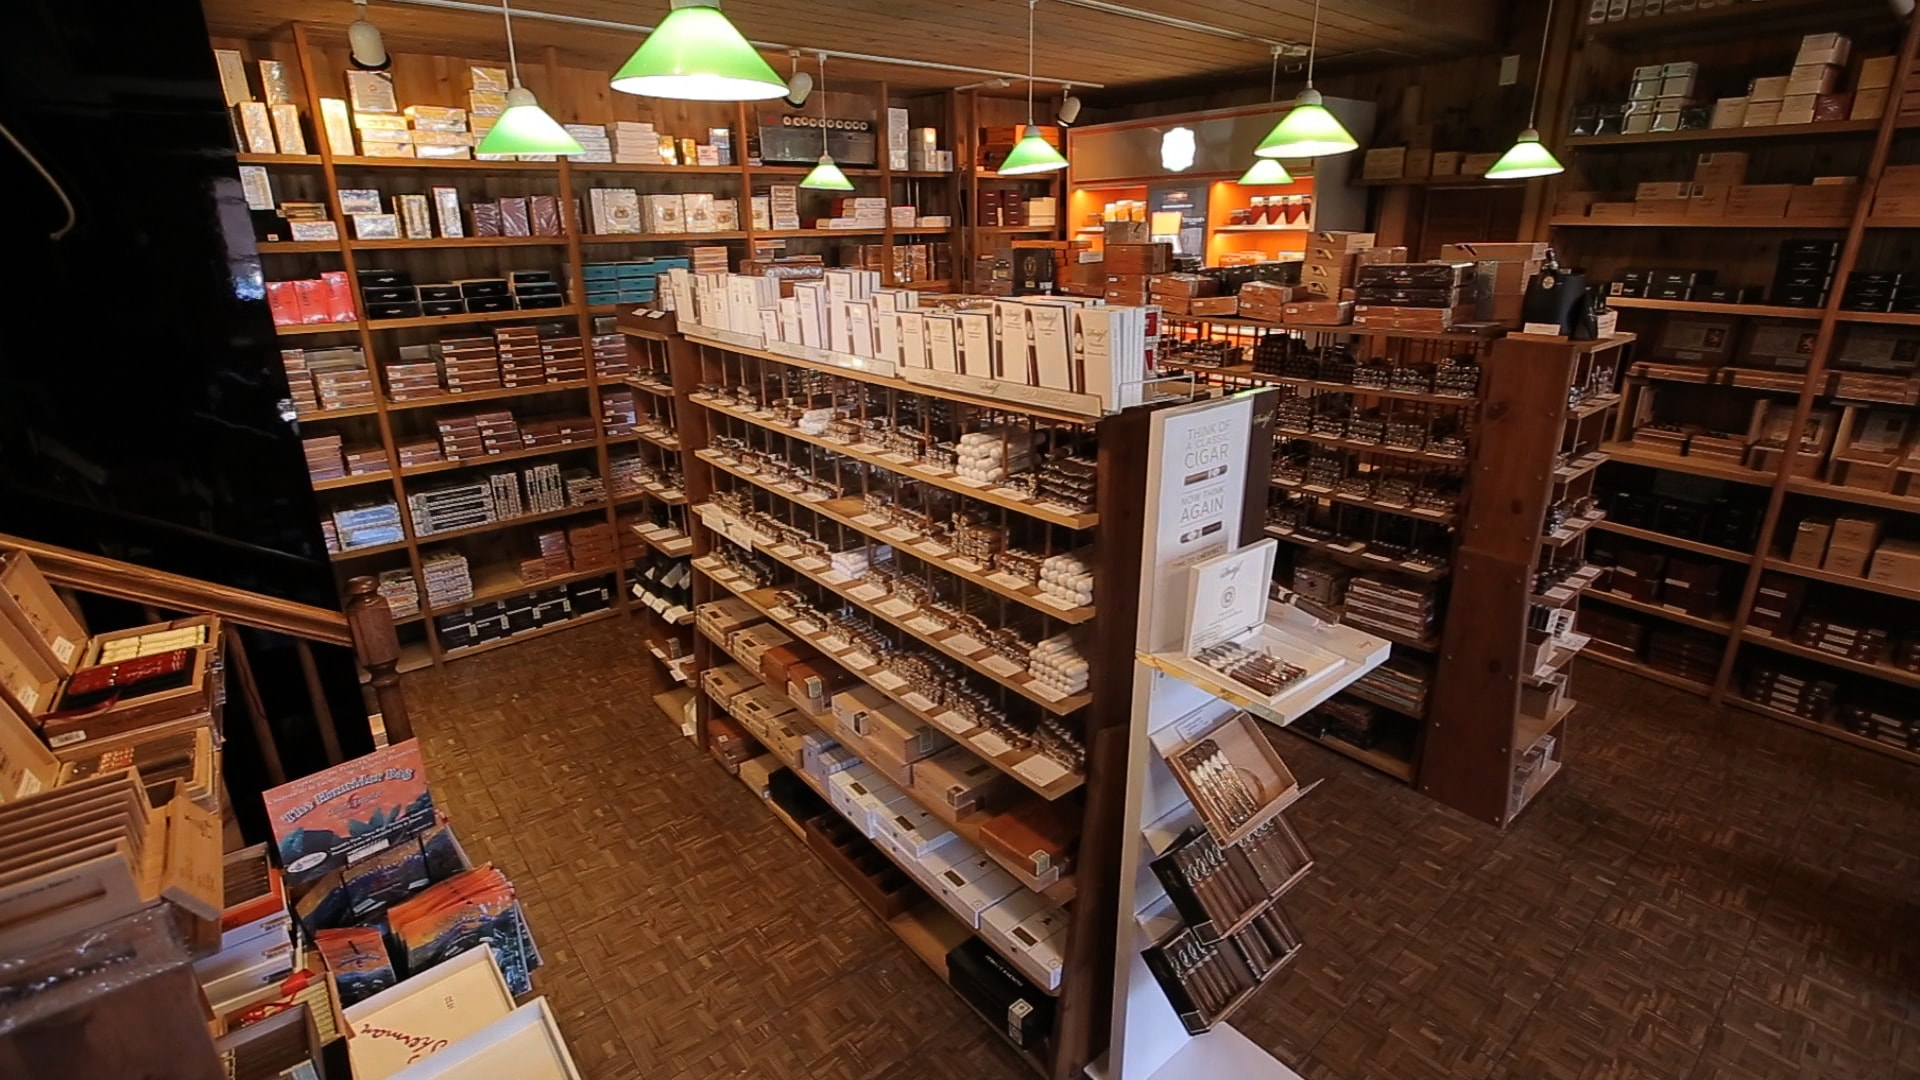 Humidor in The Tobacco Shop of Ridgewood-min.jpg